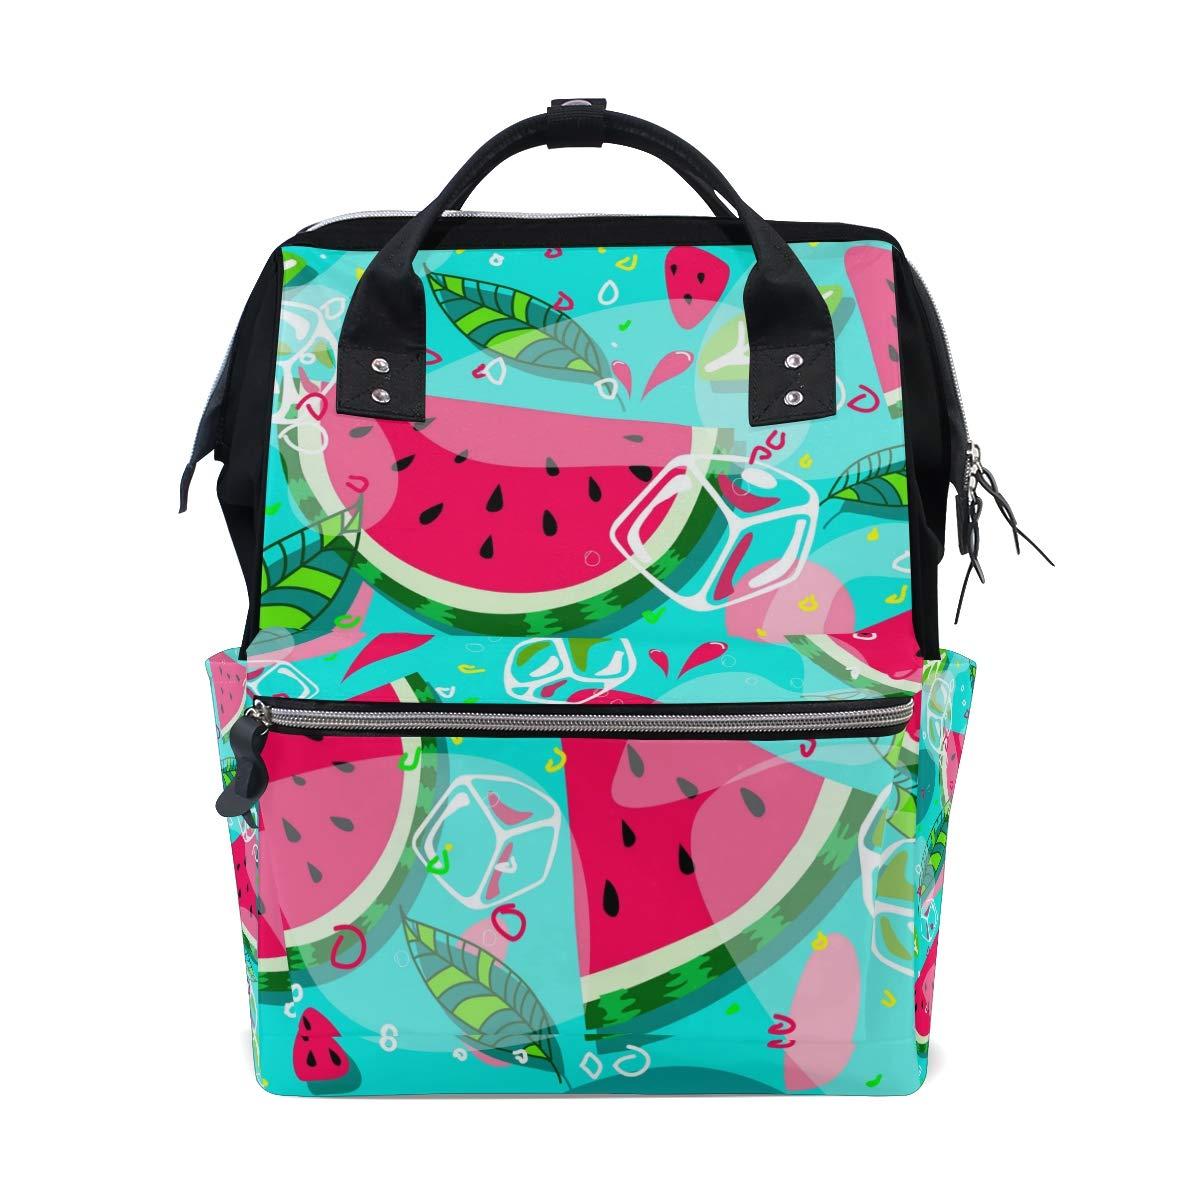 A Seed Backpack Baby Diaper Bag Tropical Summer Watermelon for Girls Women Tote Daypack Bookbag